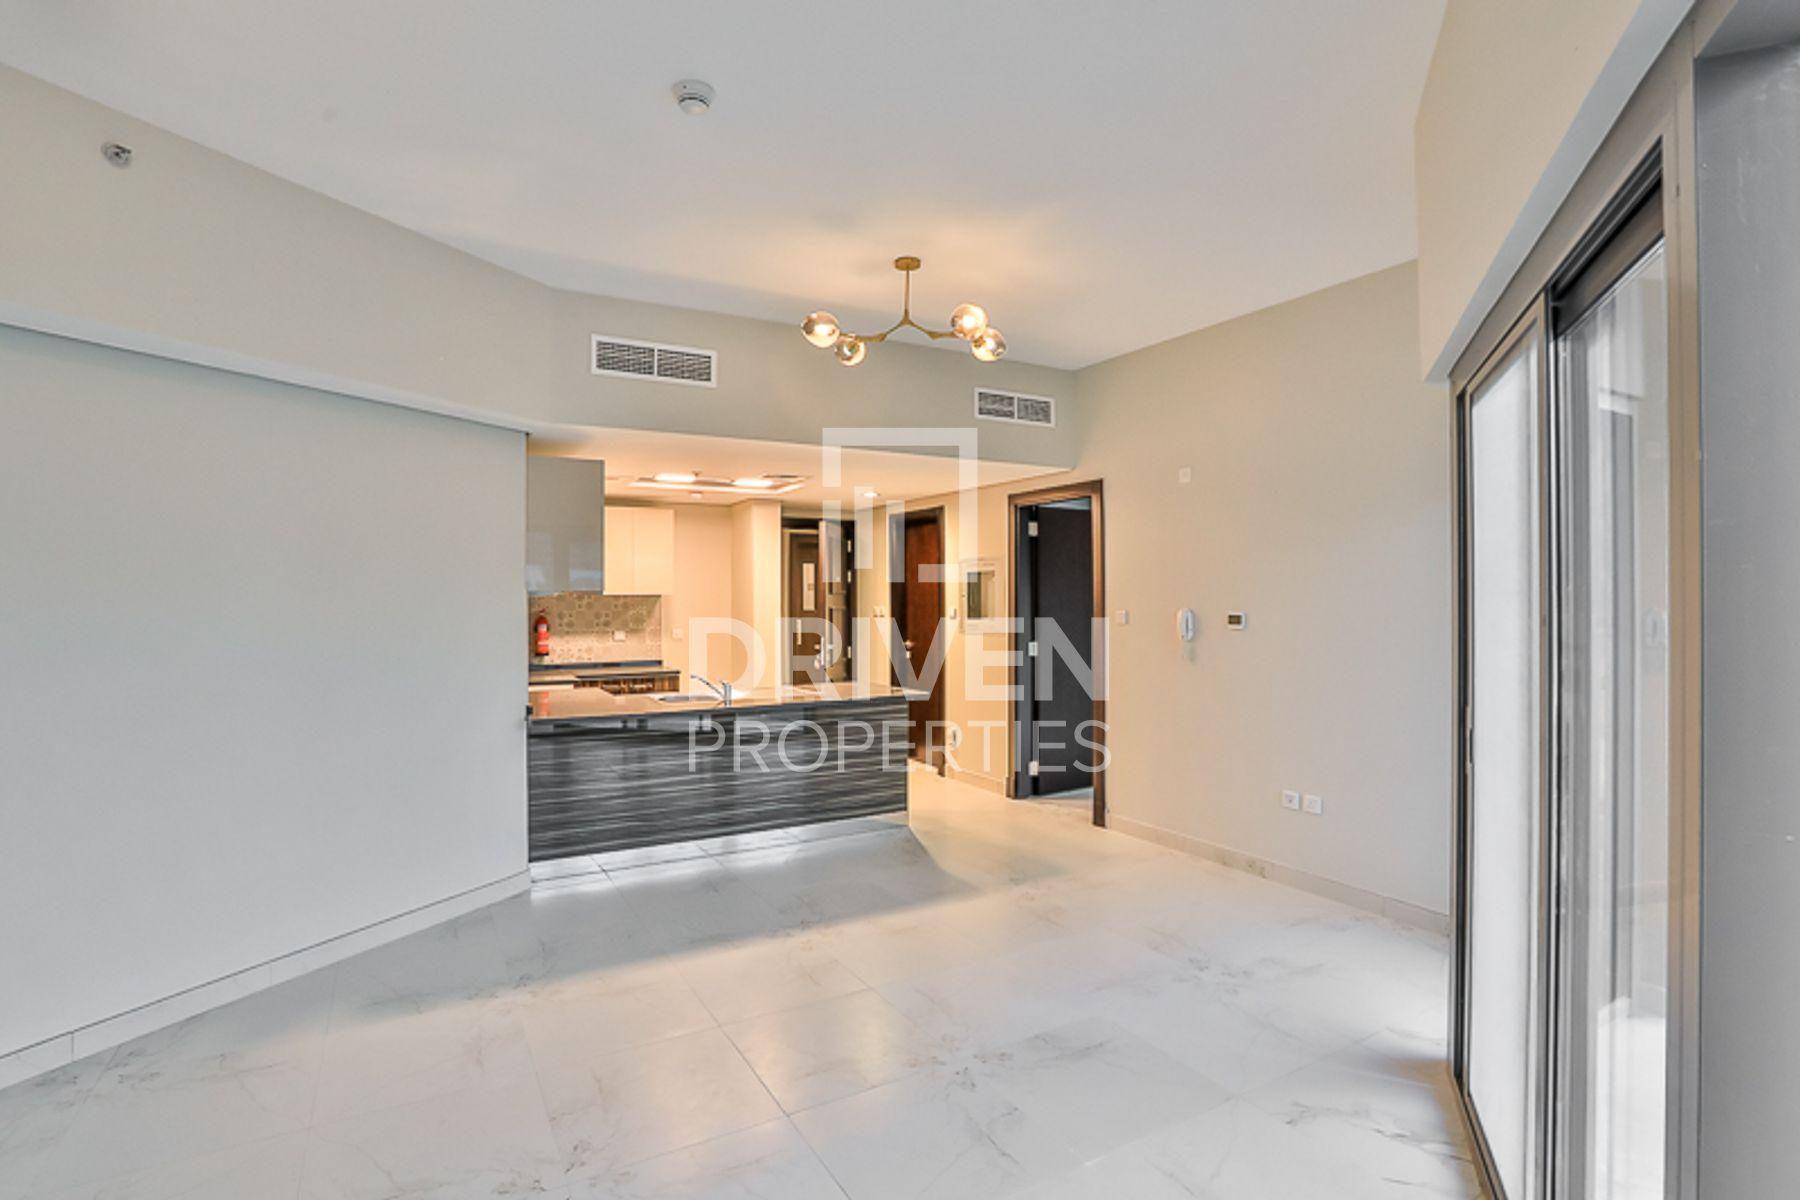 Apartment for Rent in MAG 530 - Dubai South (Dubai World Central)